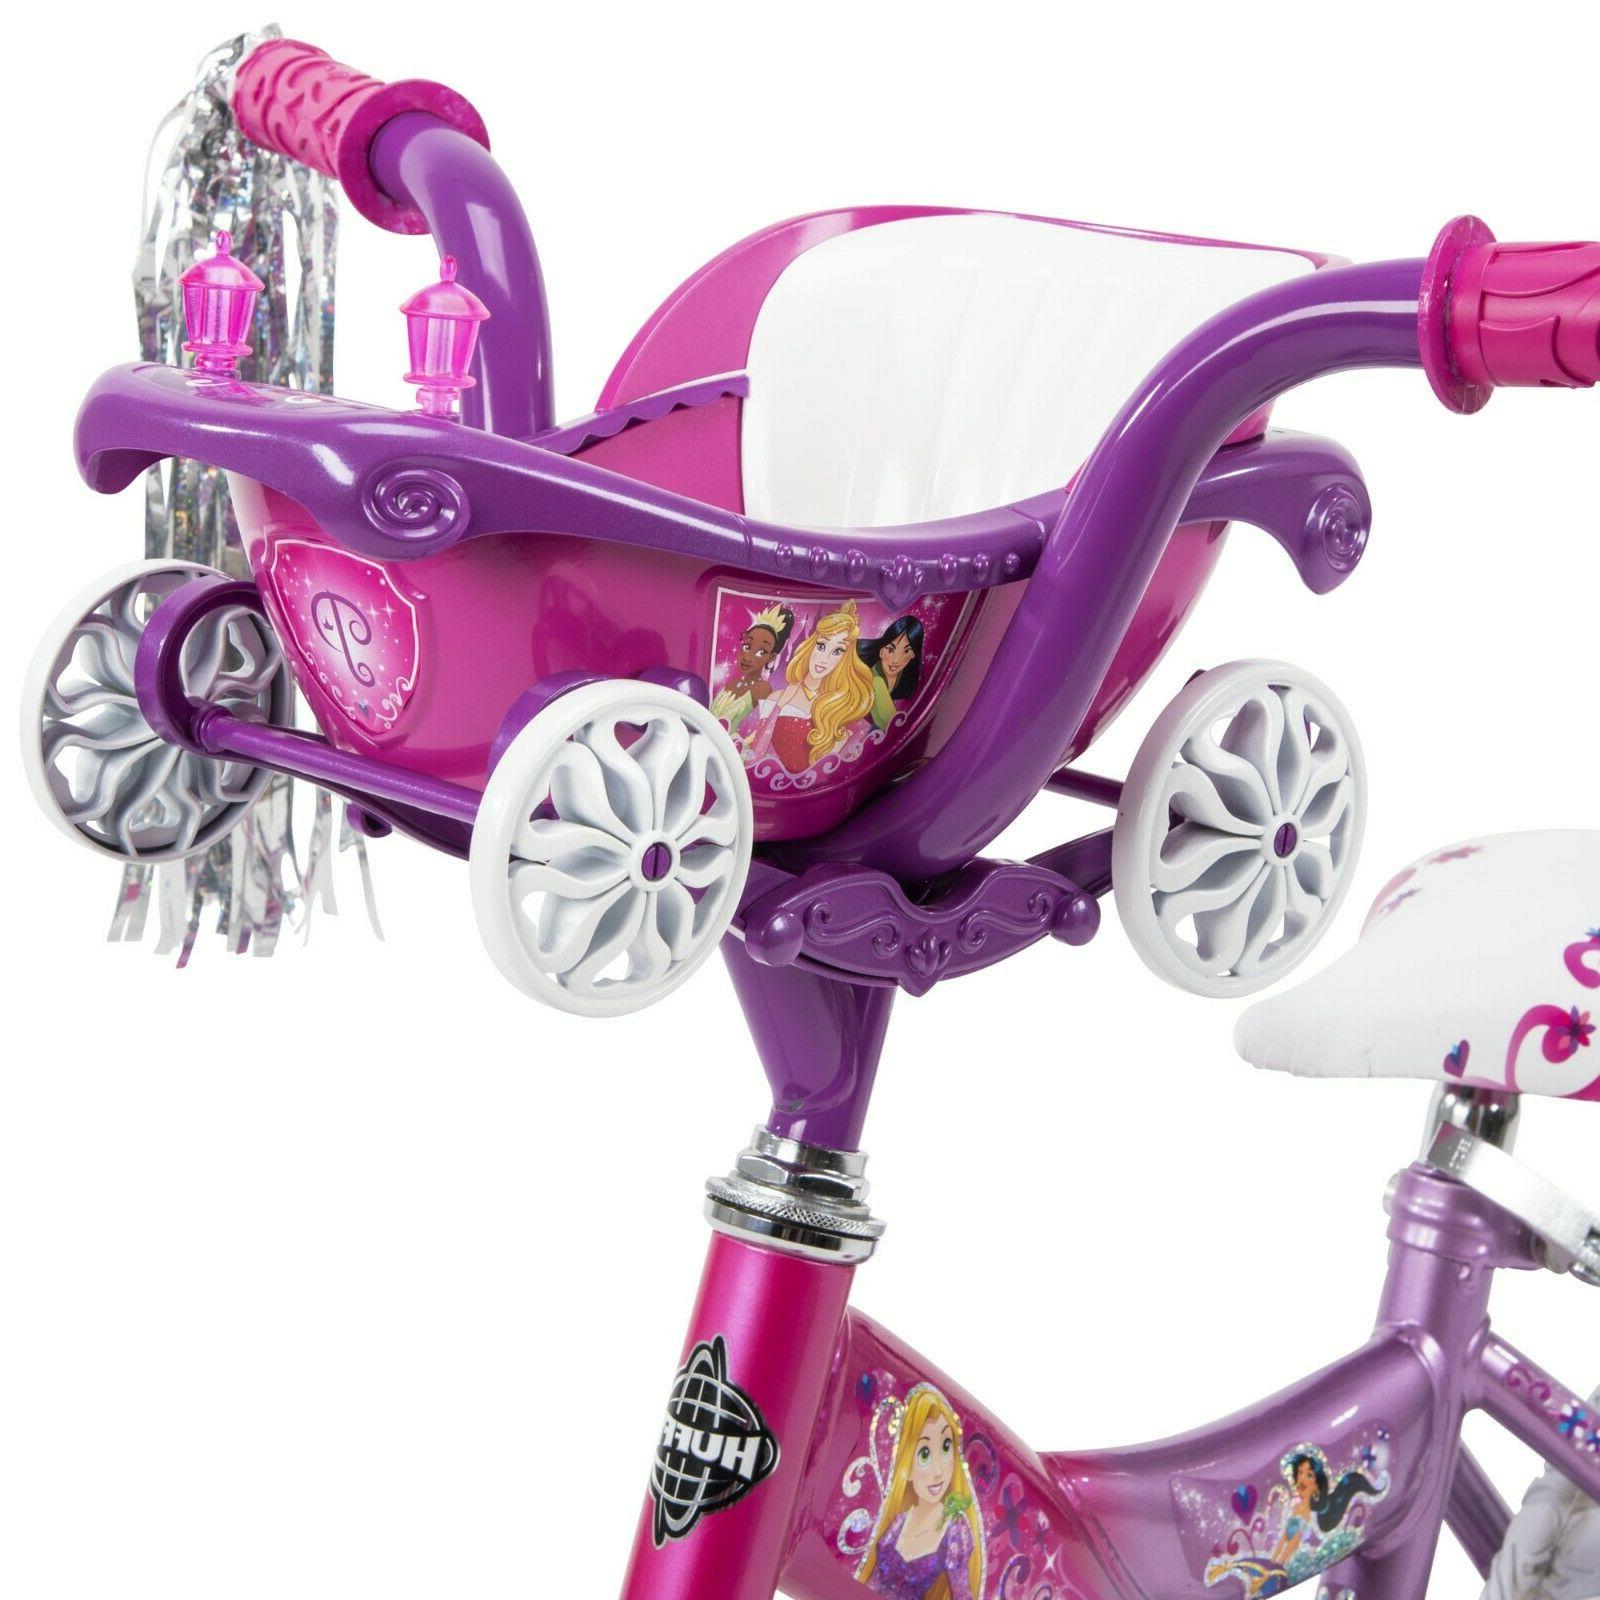 Huffy Princess Bike 12 inch, with